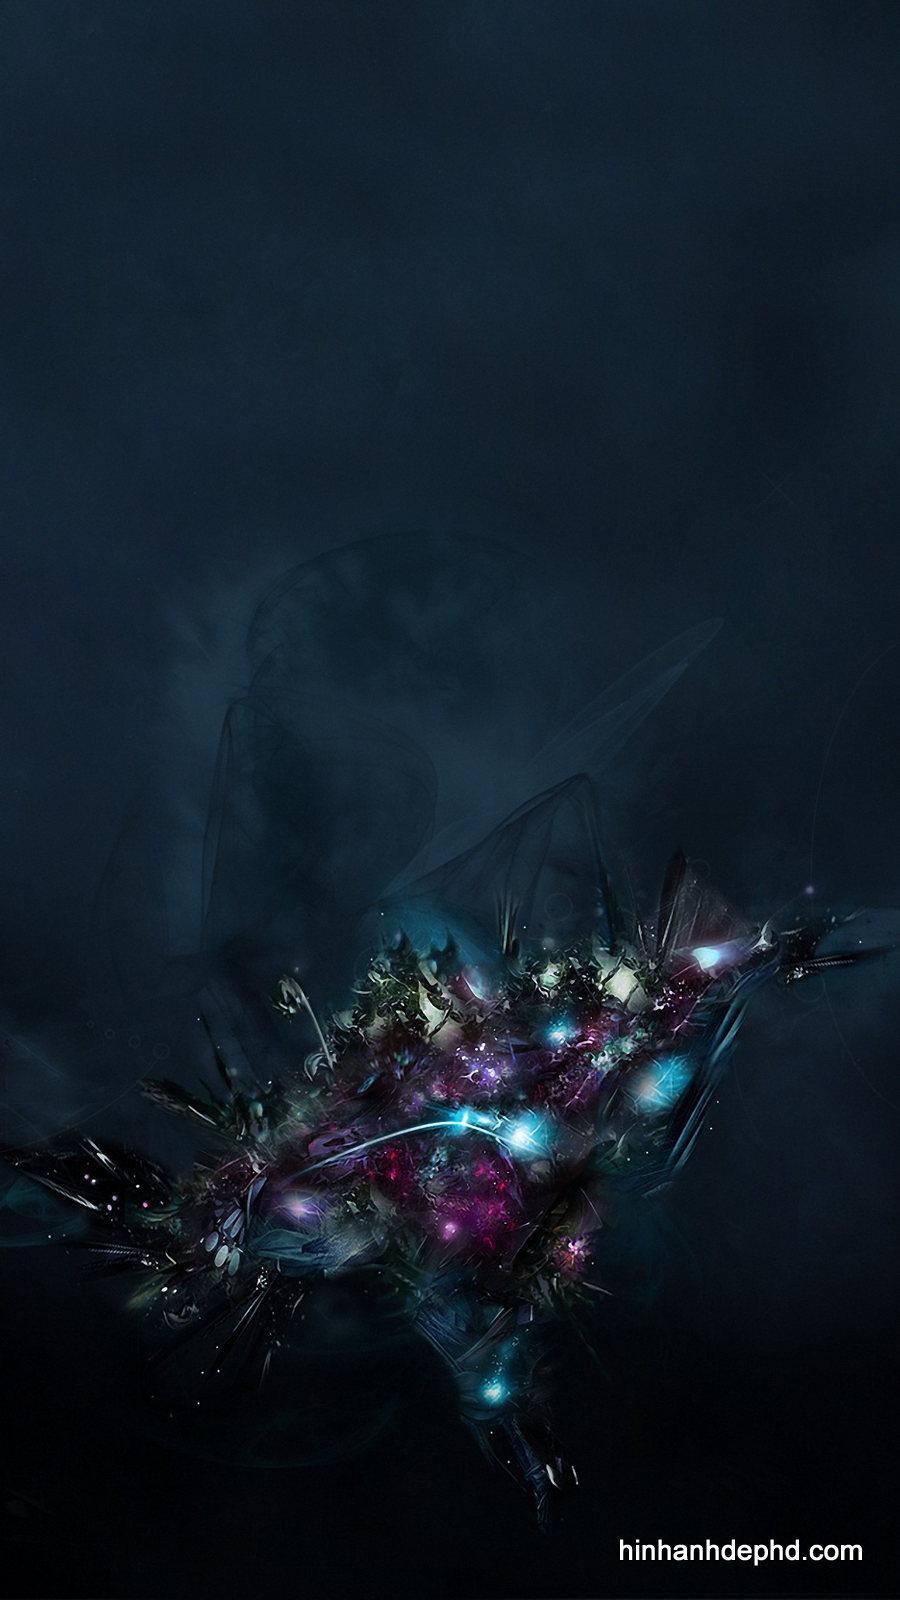 hinh-nen-galaxy-s6-7